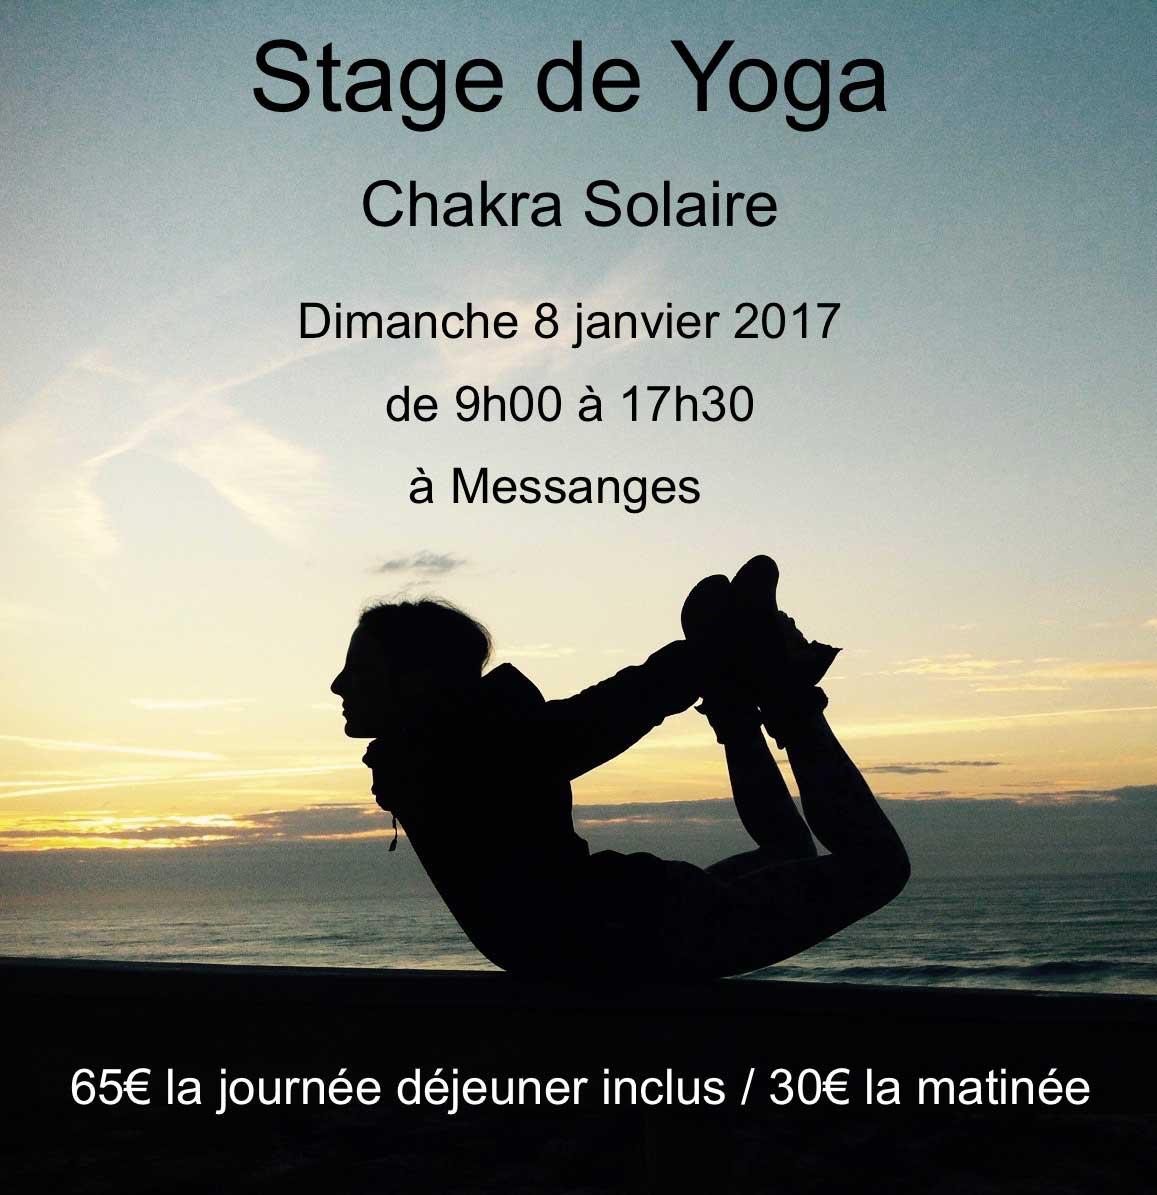 yoga-stage-lande-2017-yoganature